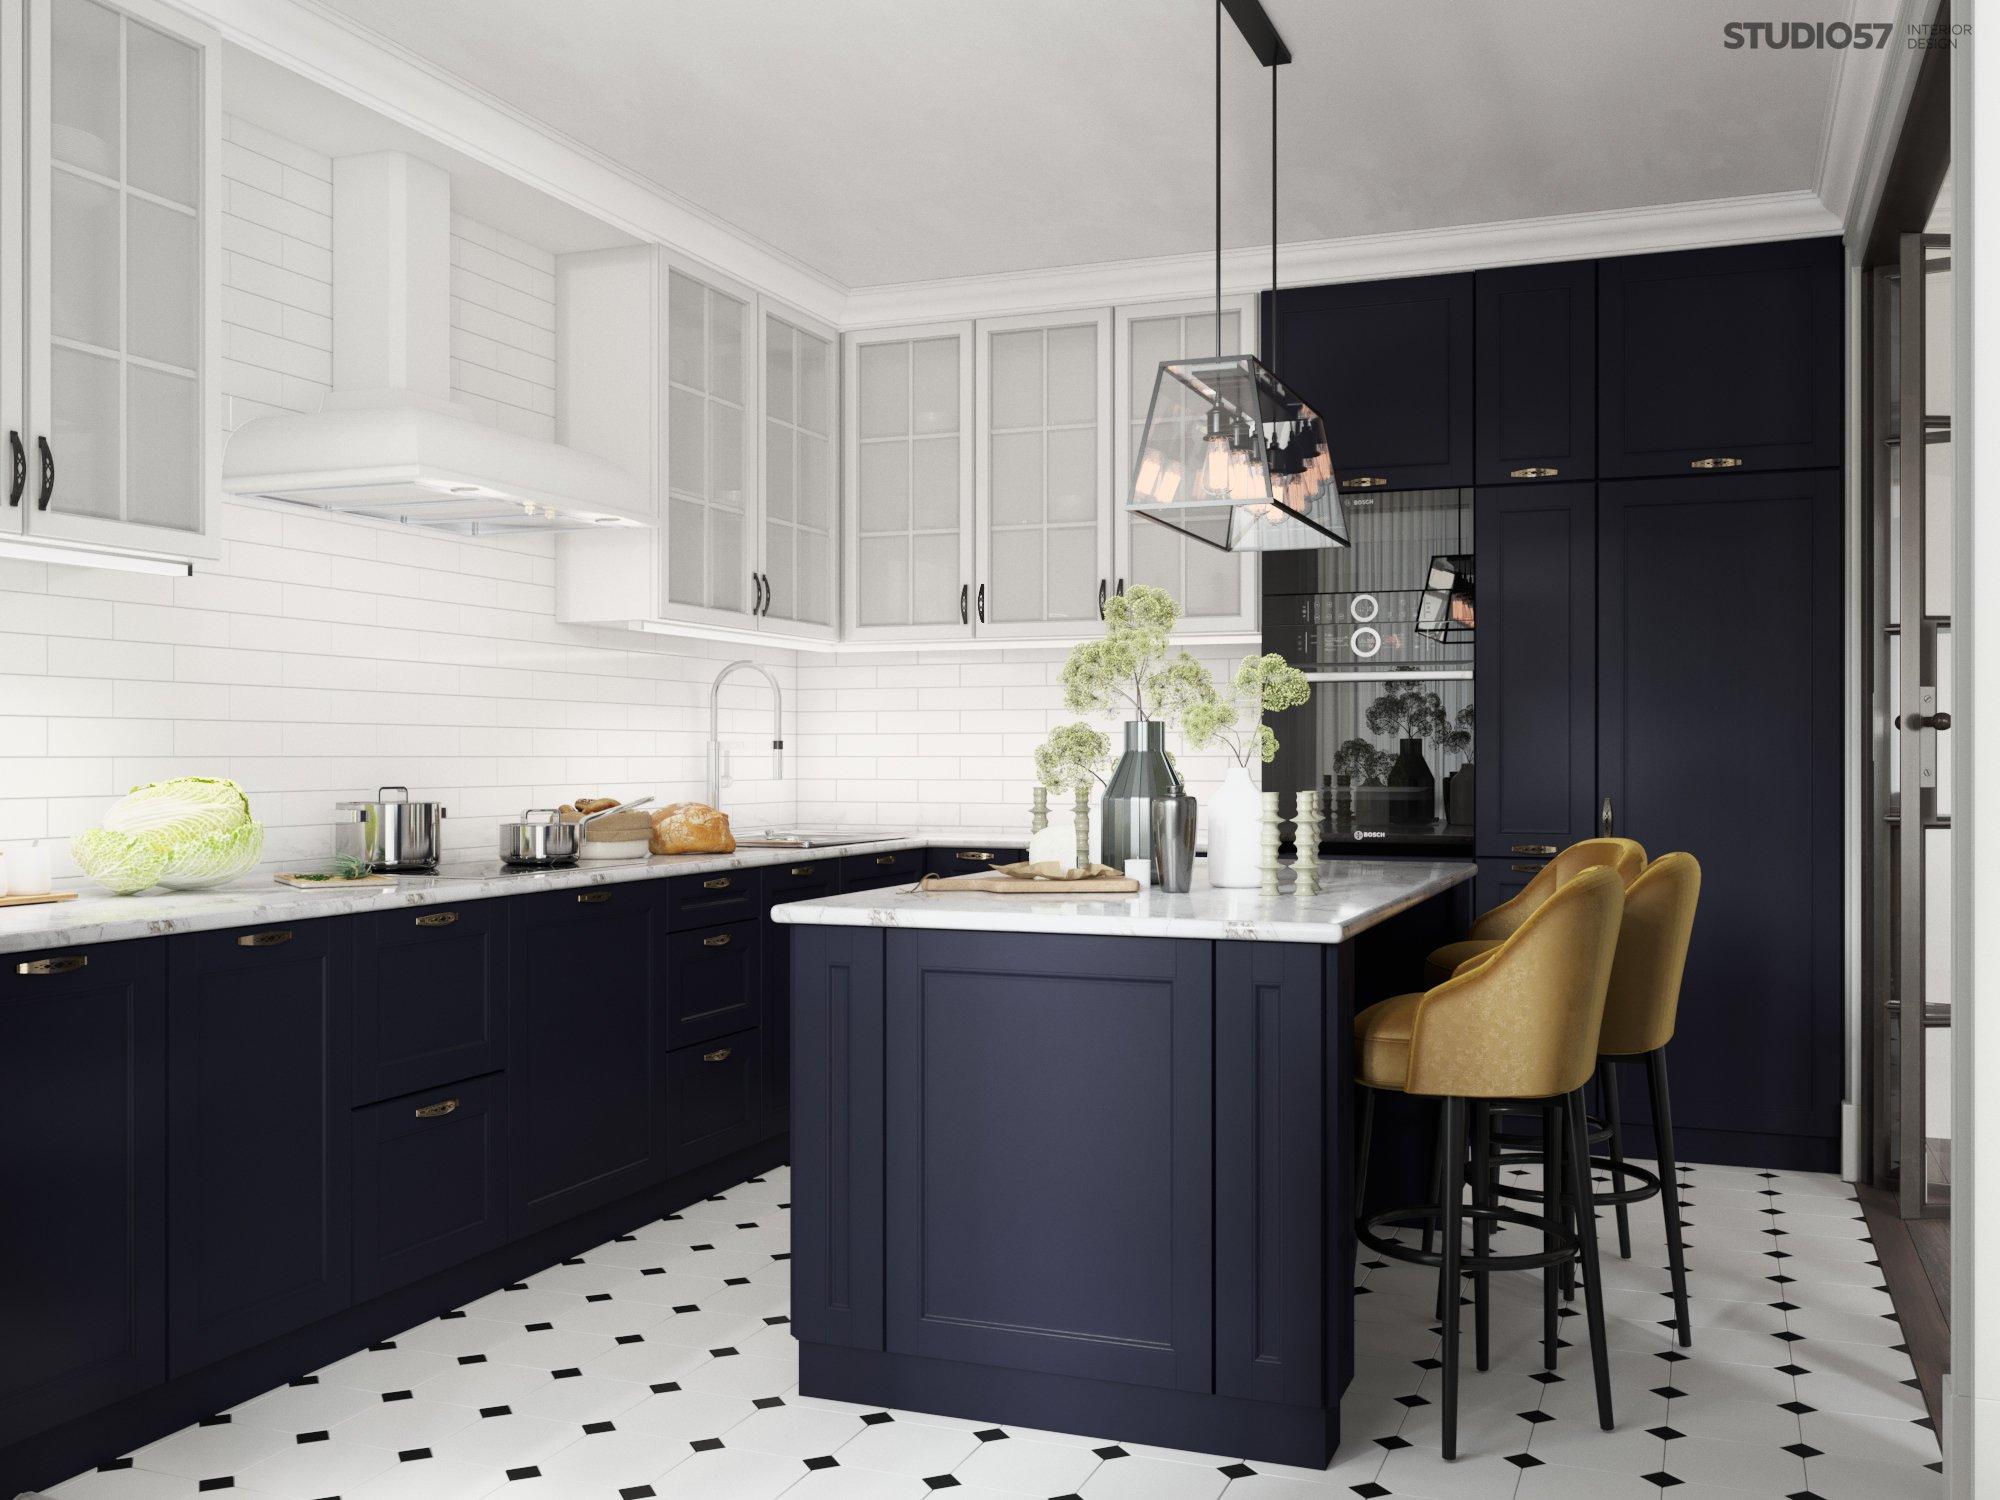 Дизайн кухни в стиле фьюжн картинка